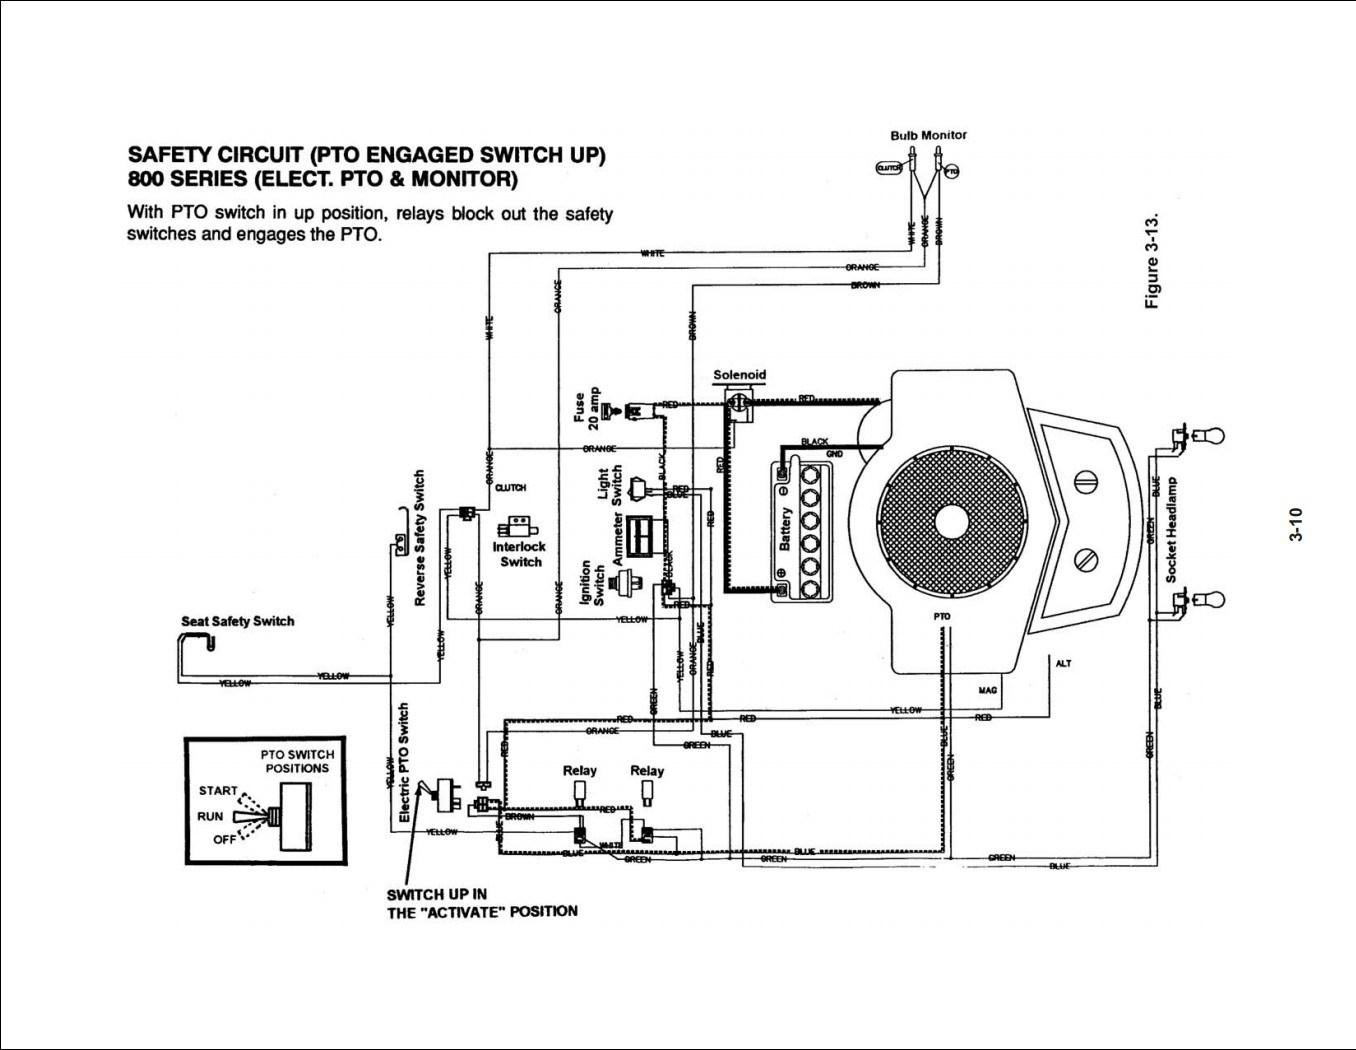 24 Hp Briggs And Stratton Wiring Diagram - Data Wiring Diagram Schematic - Briggs And Straton Wiring Diagram